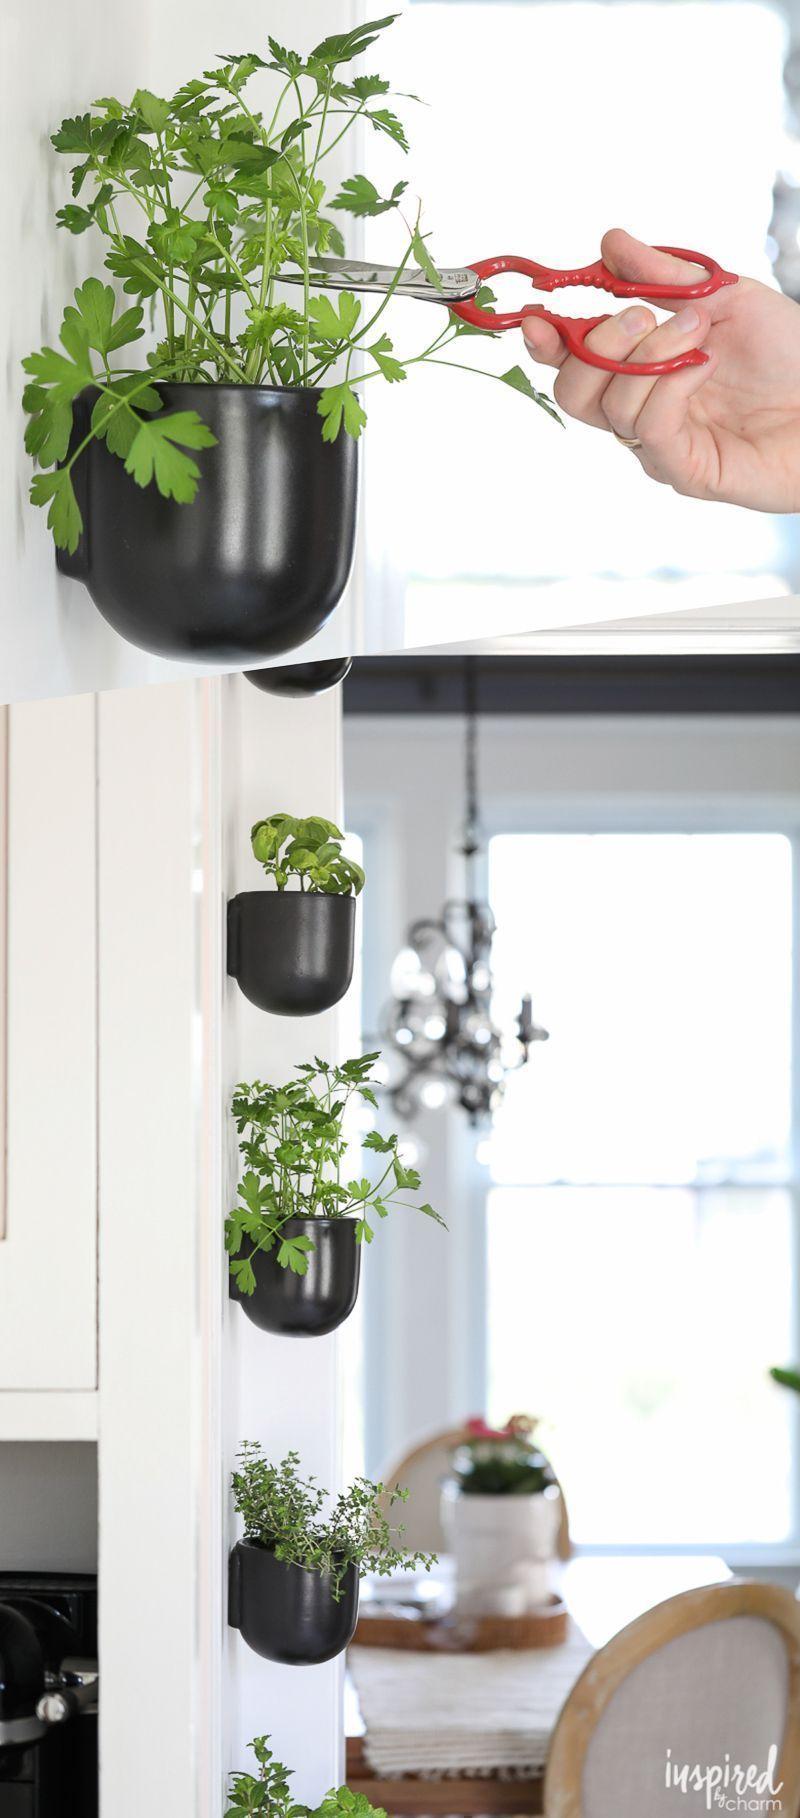 Diy Kitchen Herb Garden Vertical Wall Garden Hanging Wall Pots